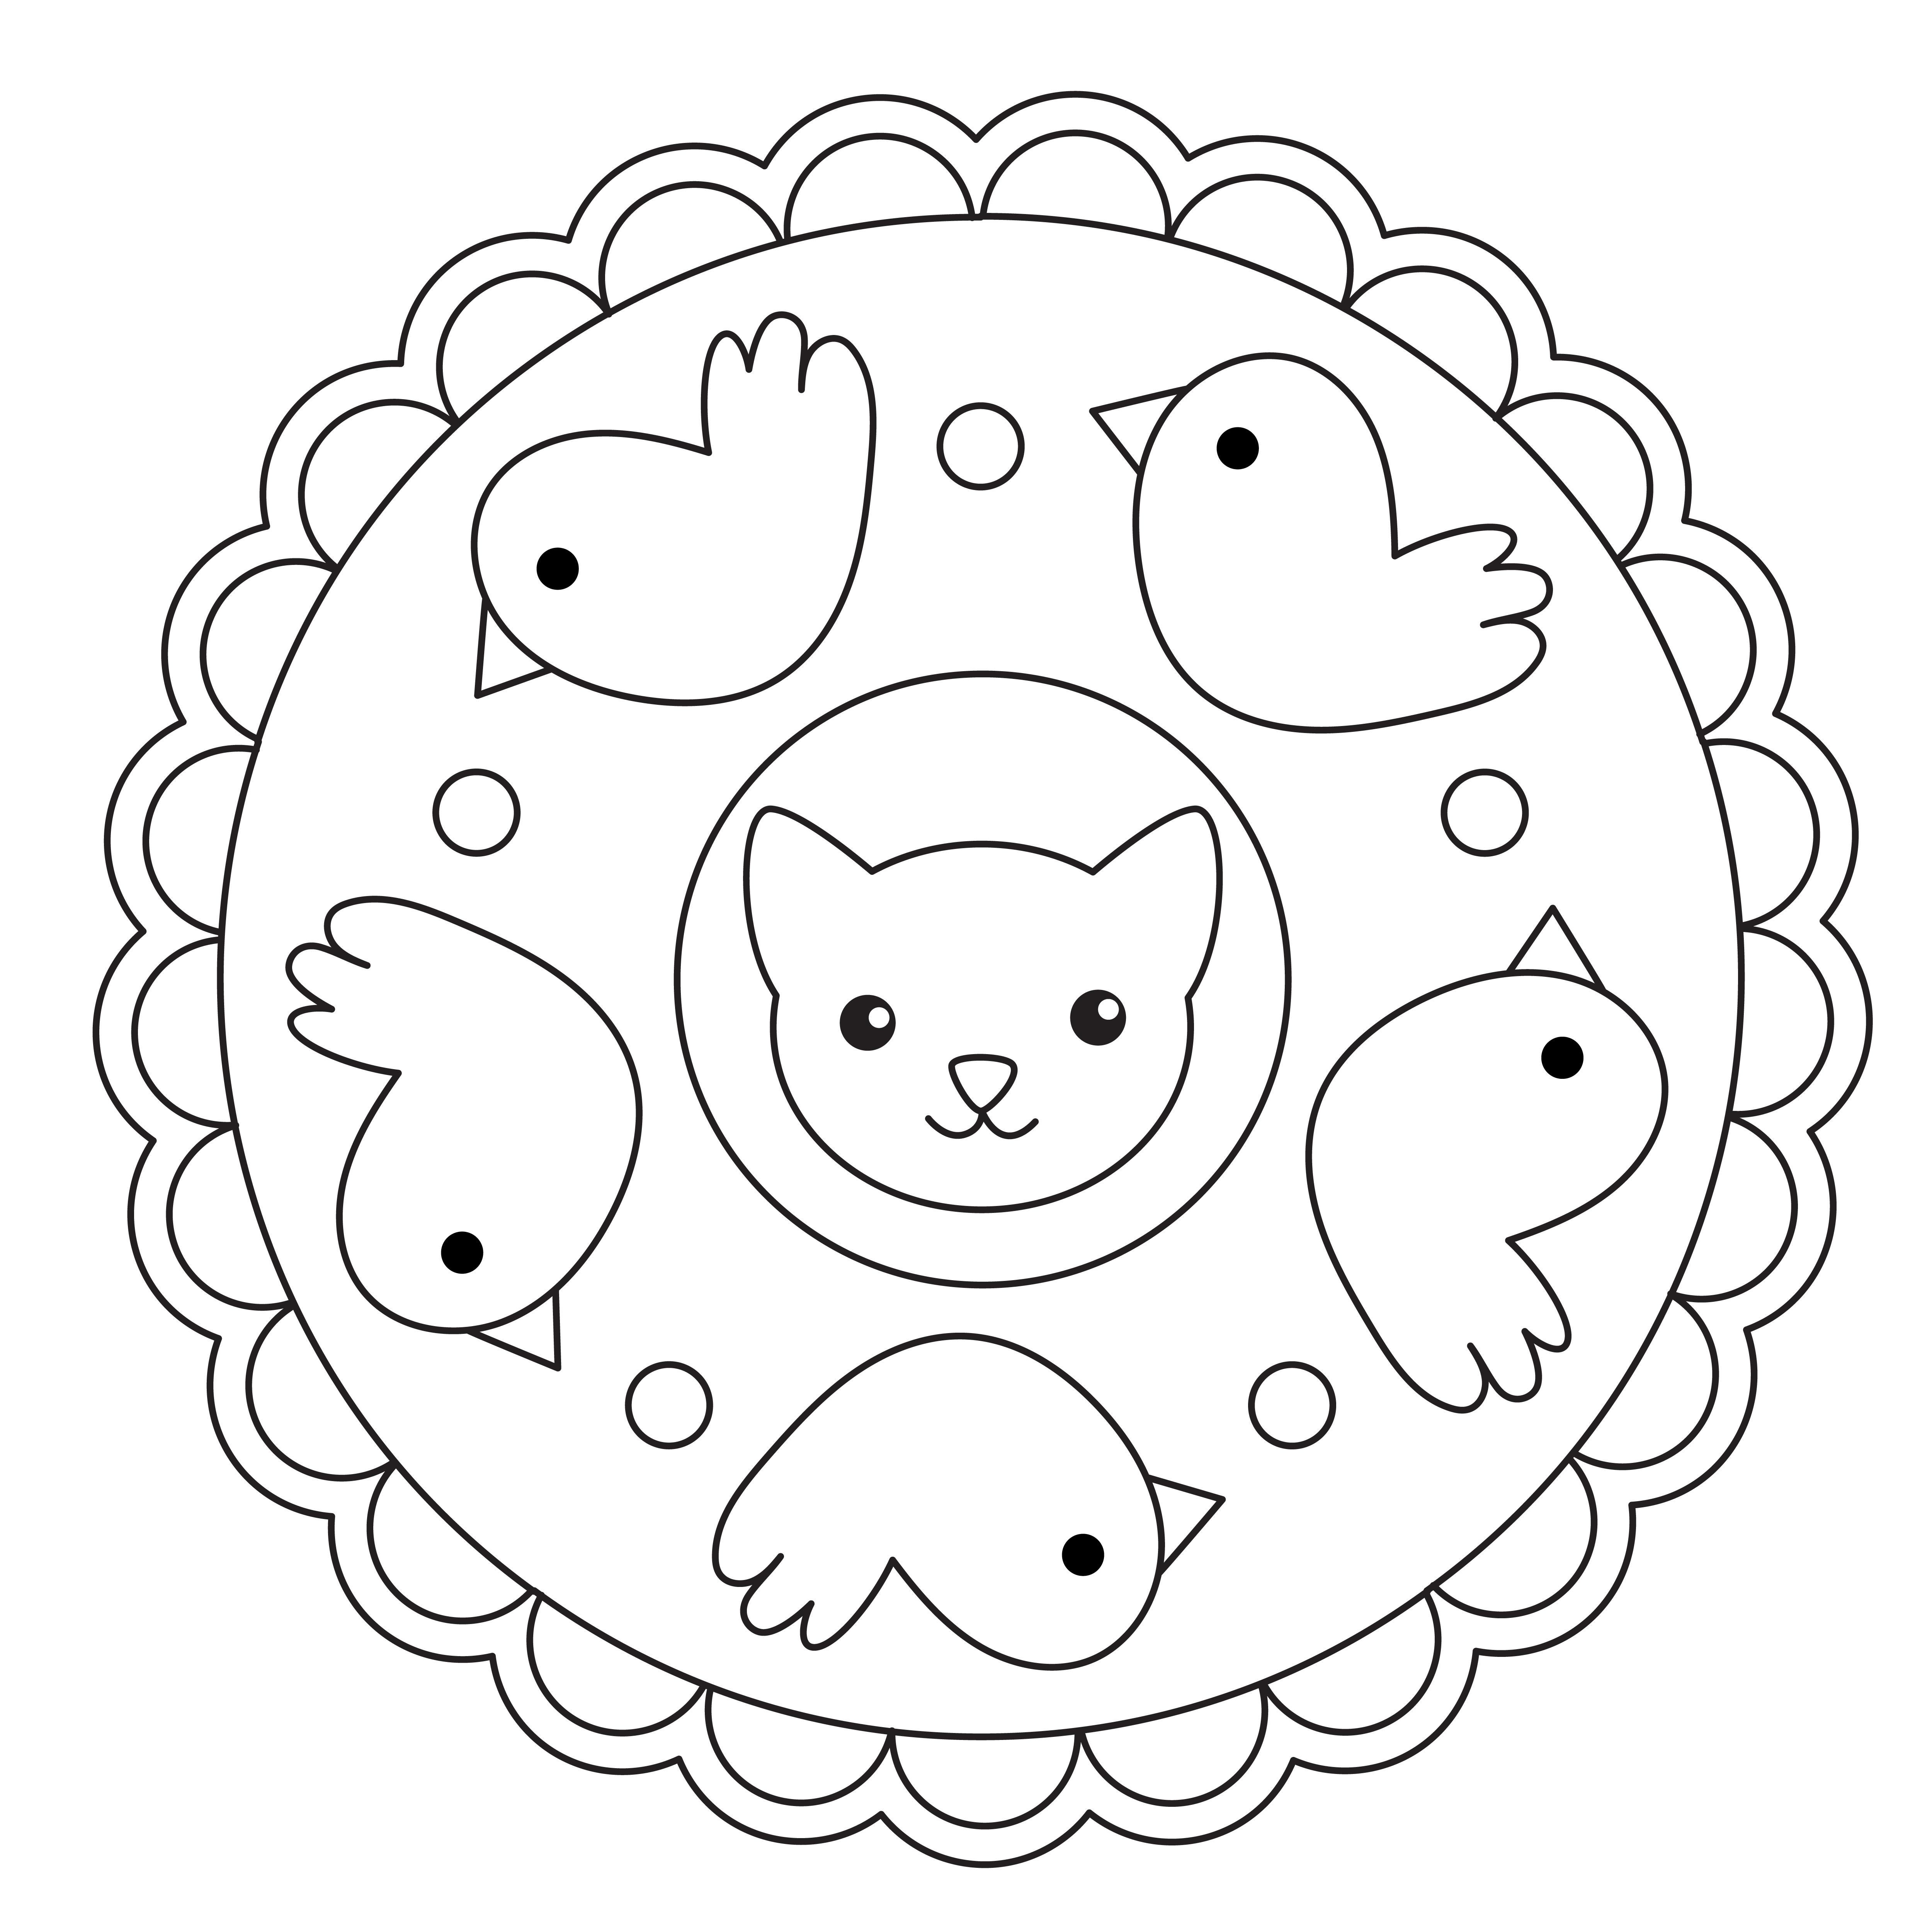 ▷ Mandalas infantiles para colorear | DEBUDA.NET